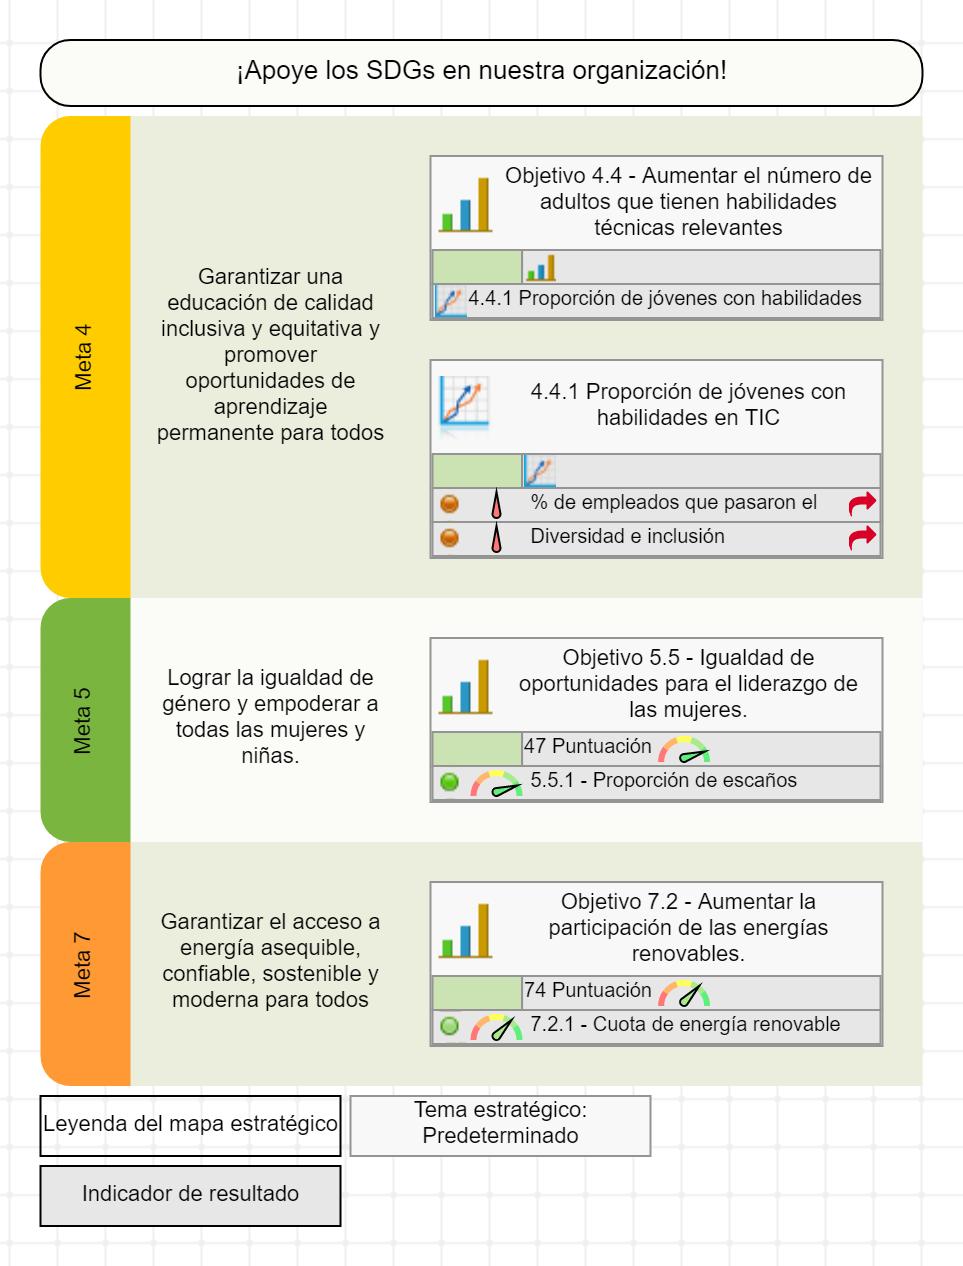 Mapa estratégico de SDGs con objetivos de negocios